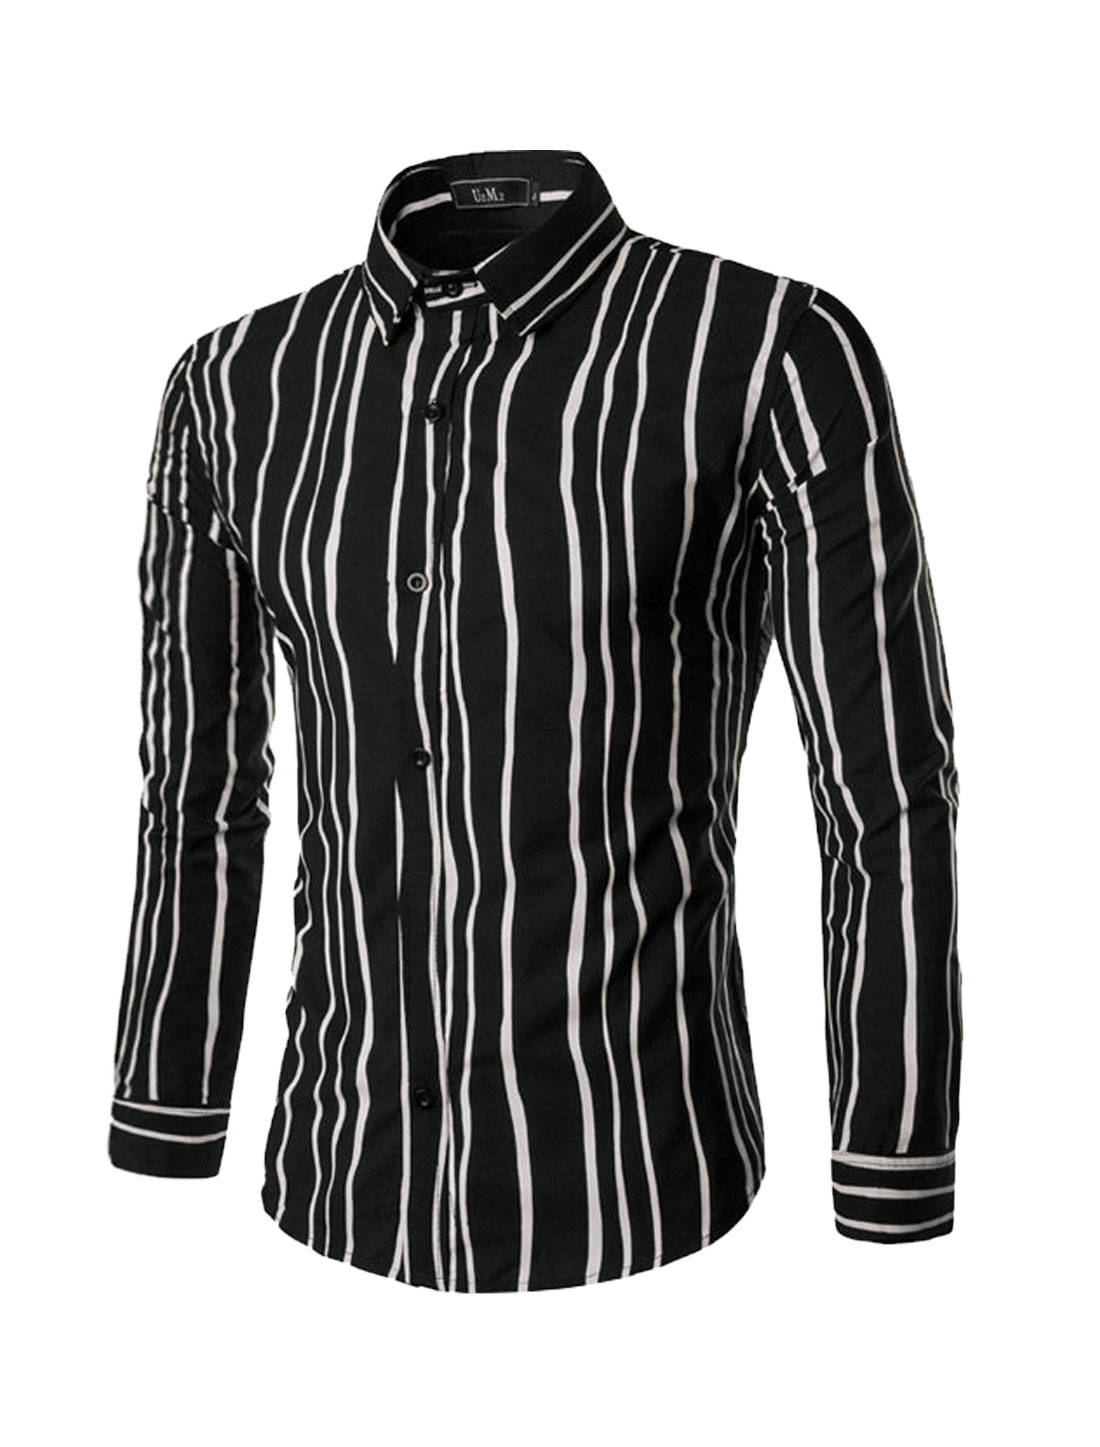 Men Long Sleeves Single Breasted Stripes Slim Fit Shirt Black M